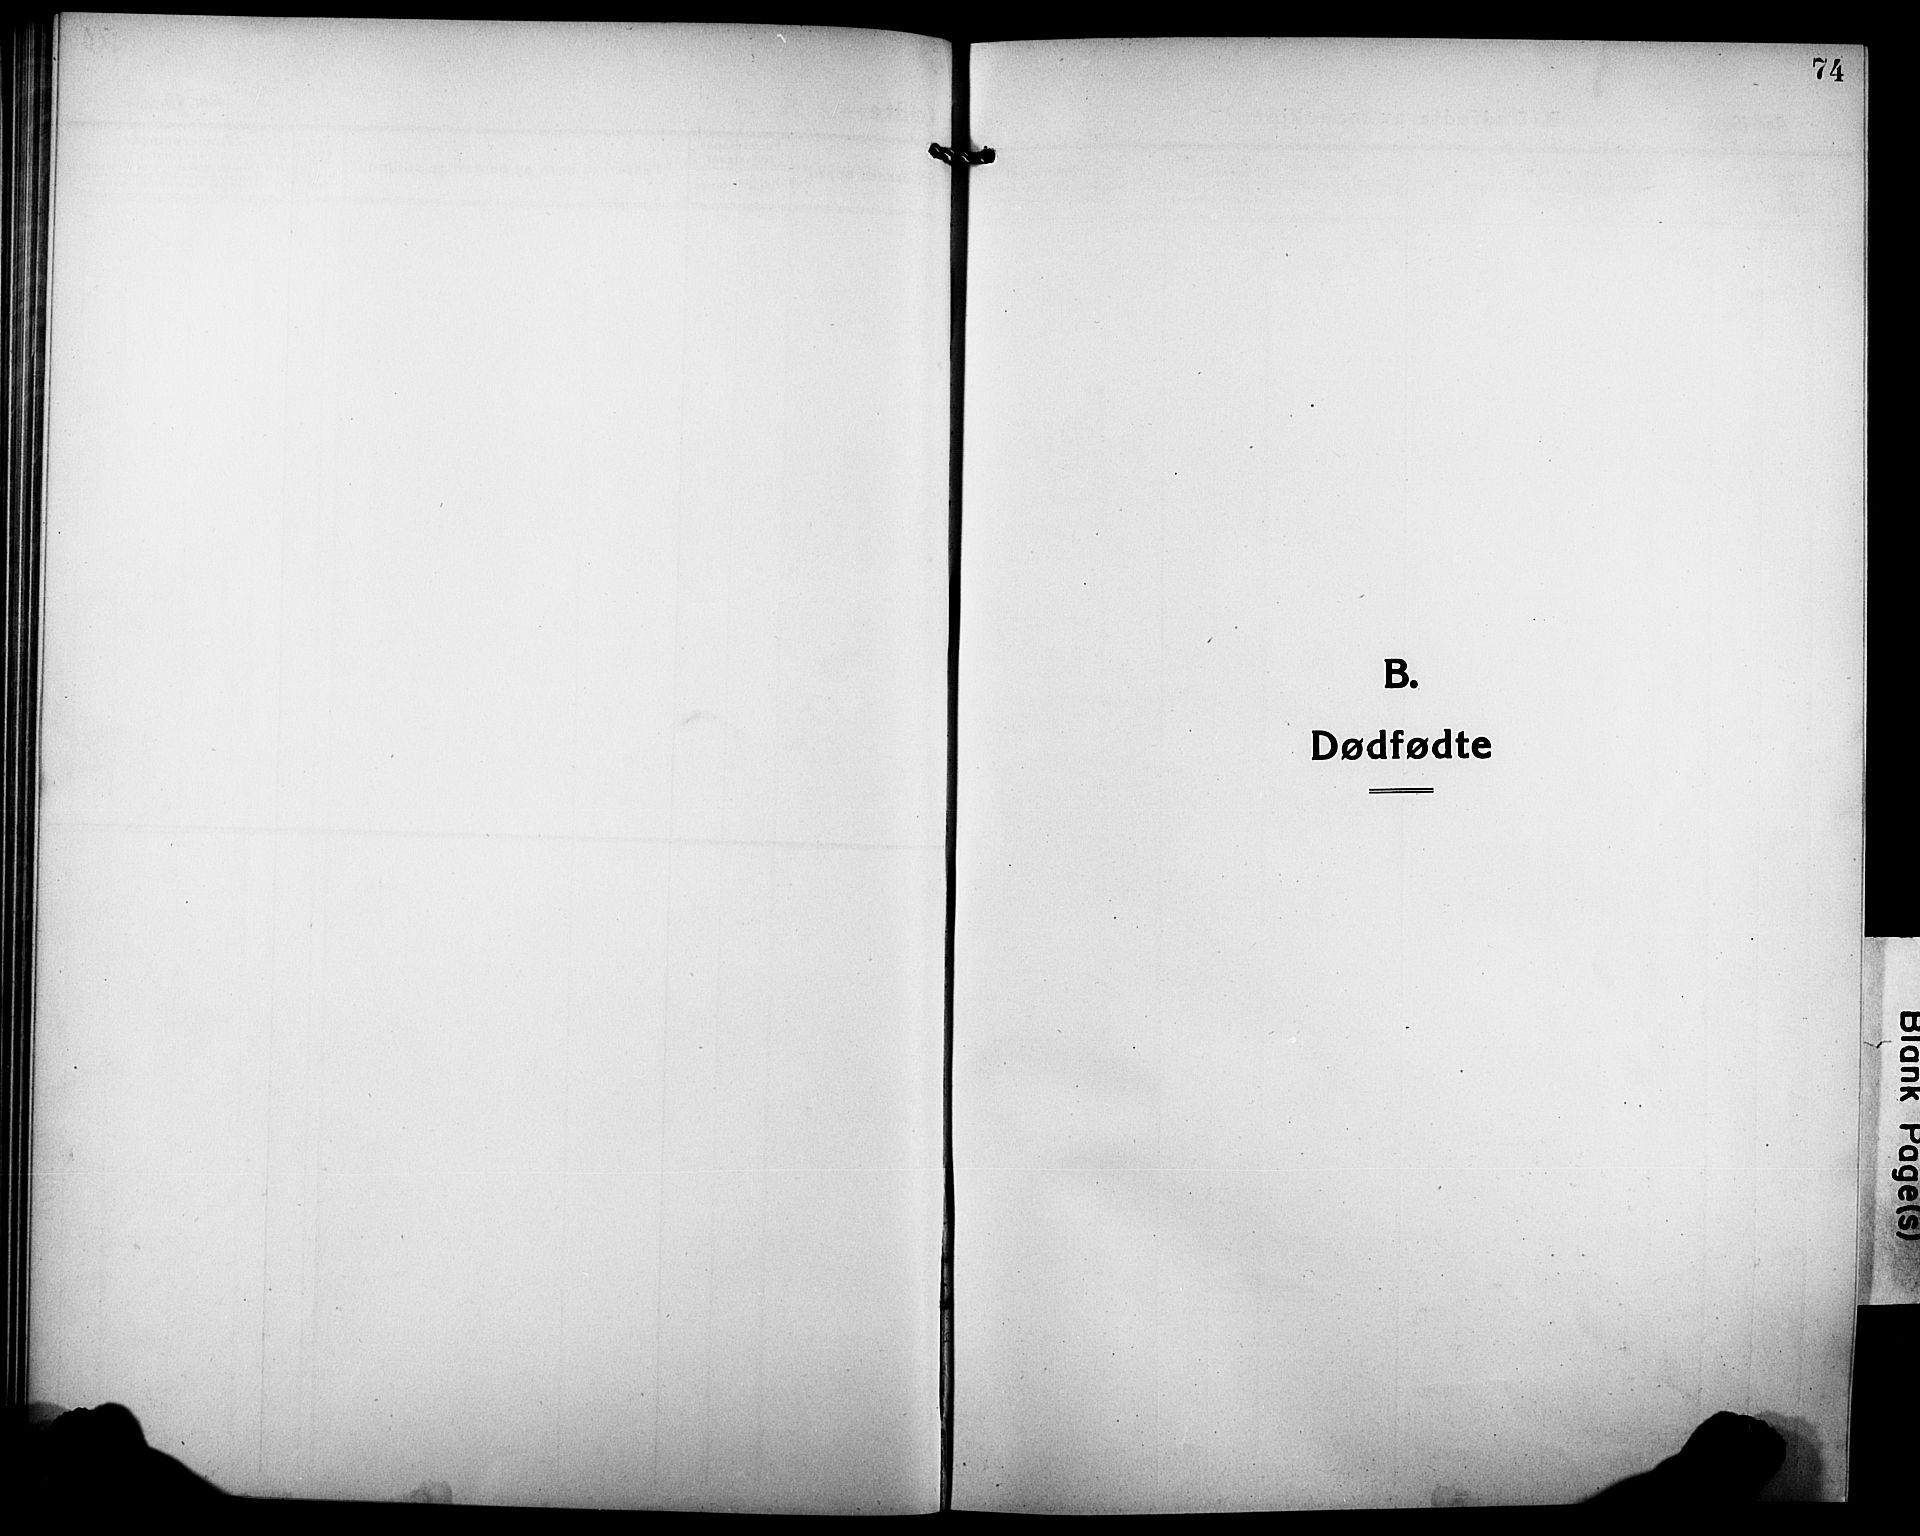 SATØ, Tranøy sokneprestkontor, I/Ia/Iab/L0006klokker: Parish register (copy) no. 6, 1919-1932, p. 74